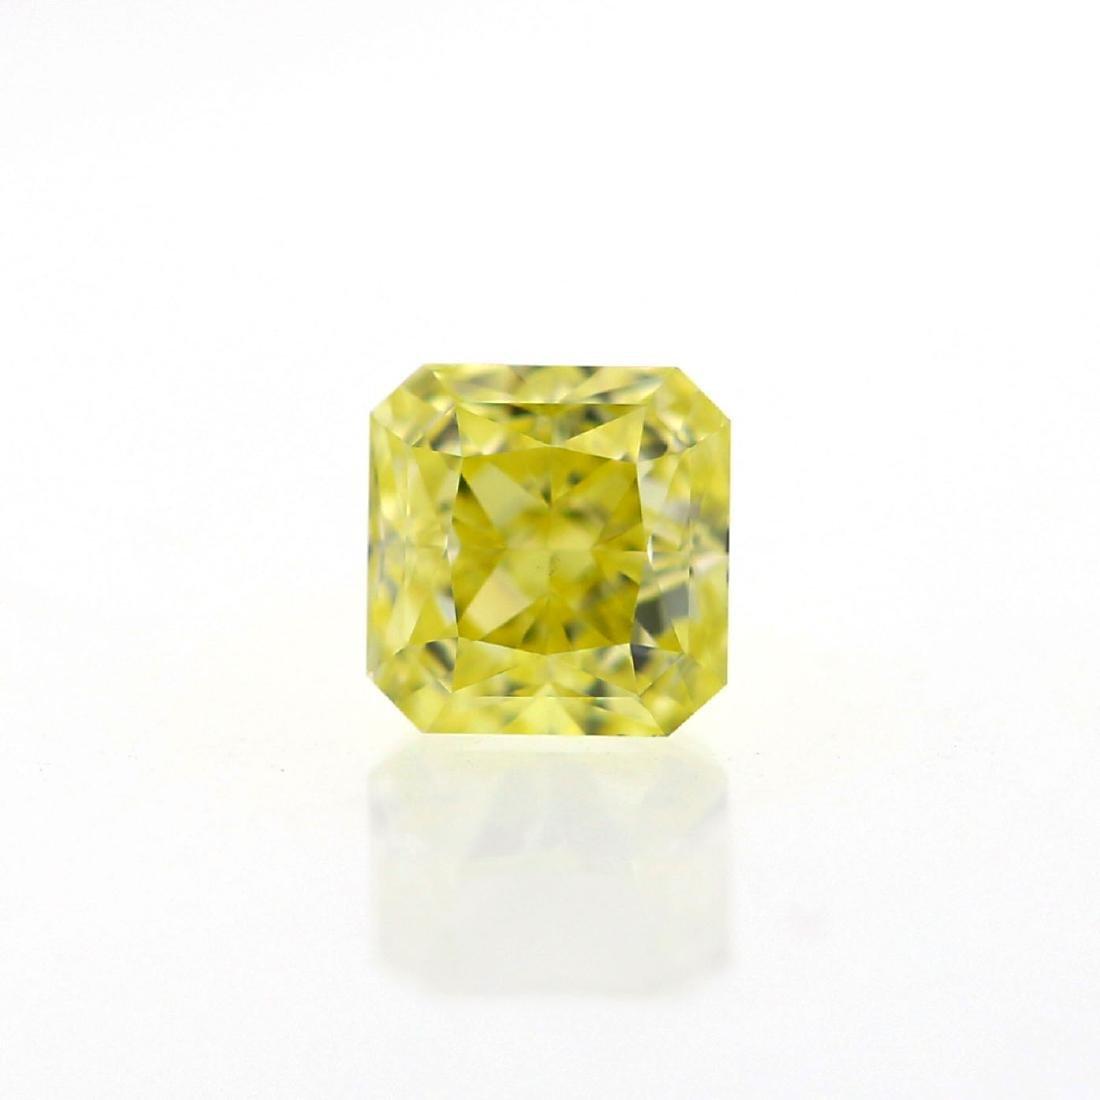 Natural Fancy Yellow 0.73 ct Radiant VS2 Diamond, GIA